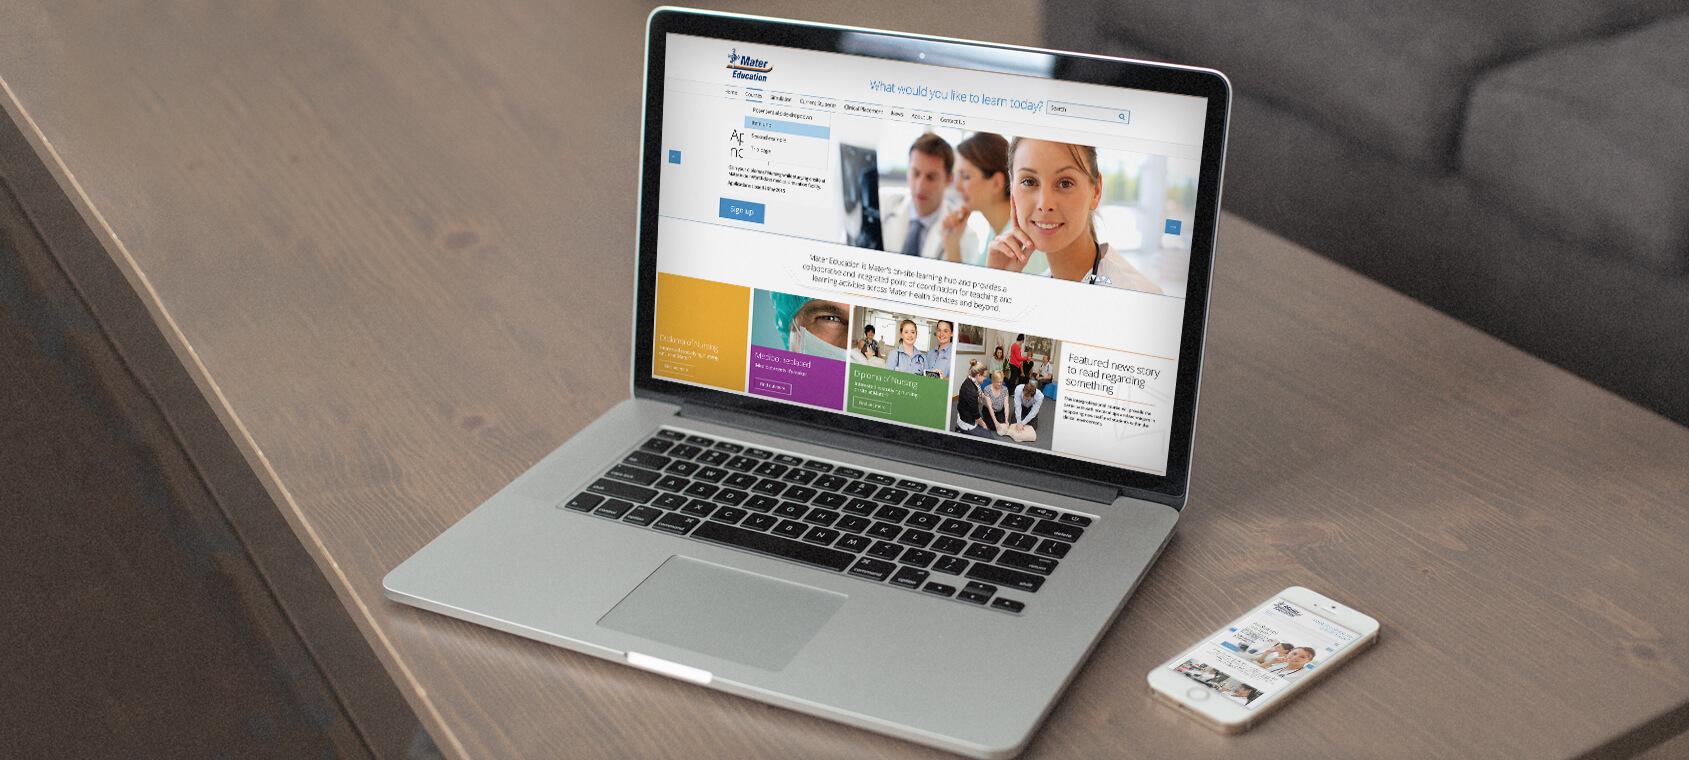 homepage-slider_mater-hospital-macbook-computer